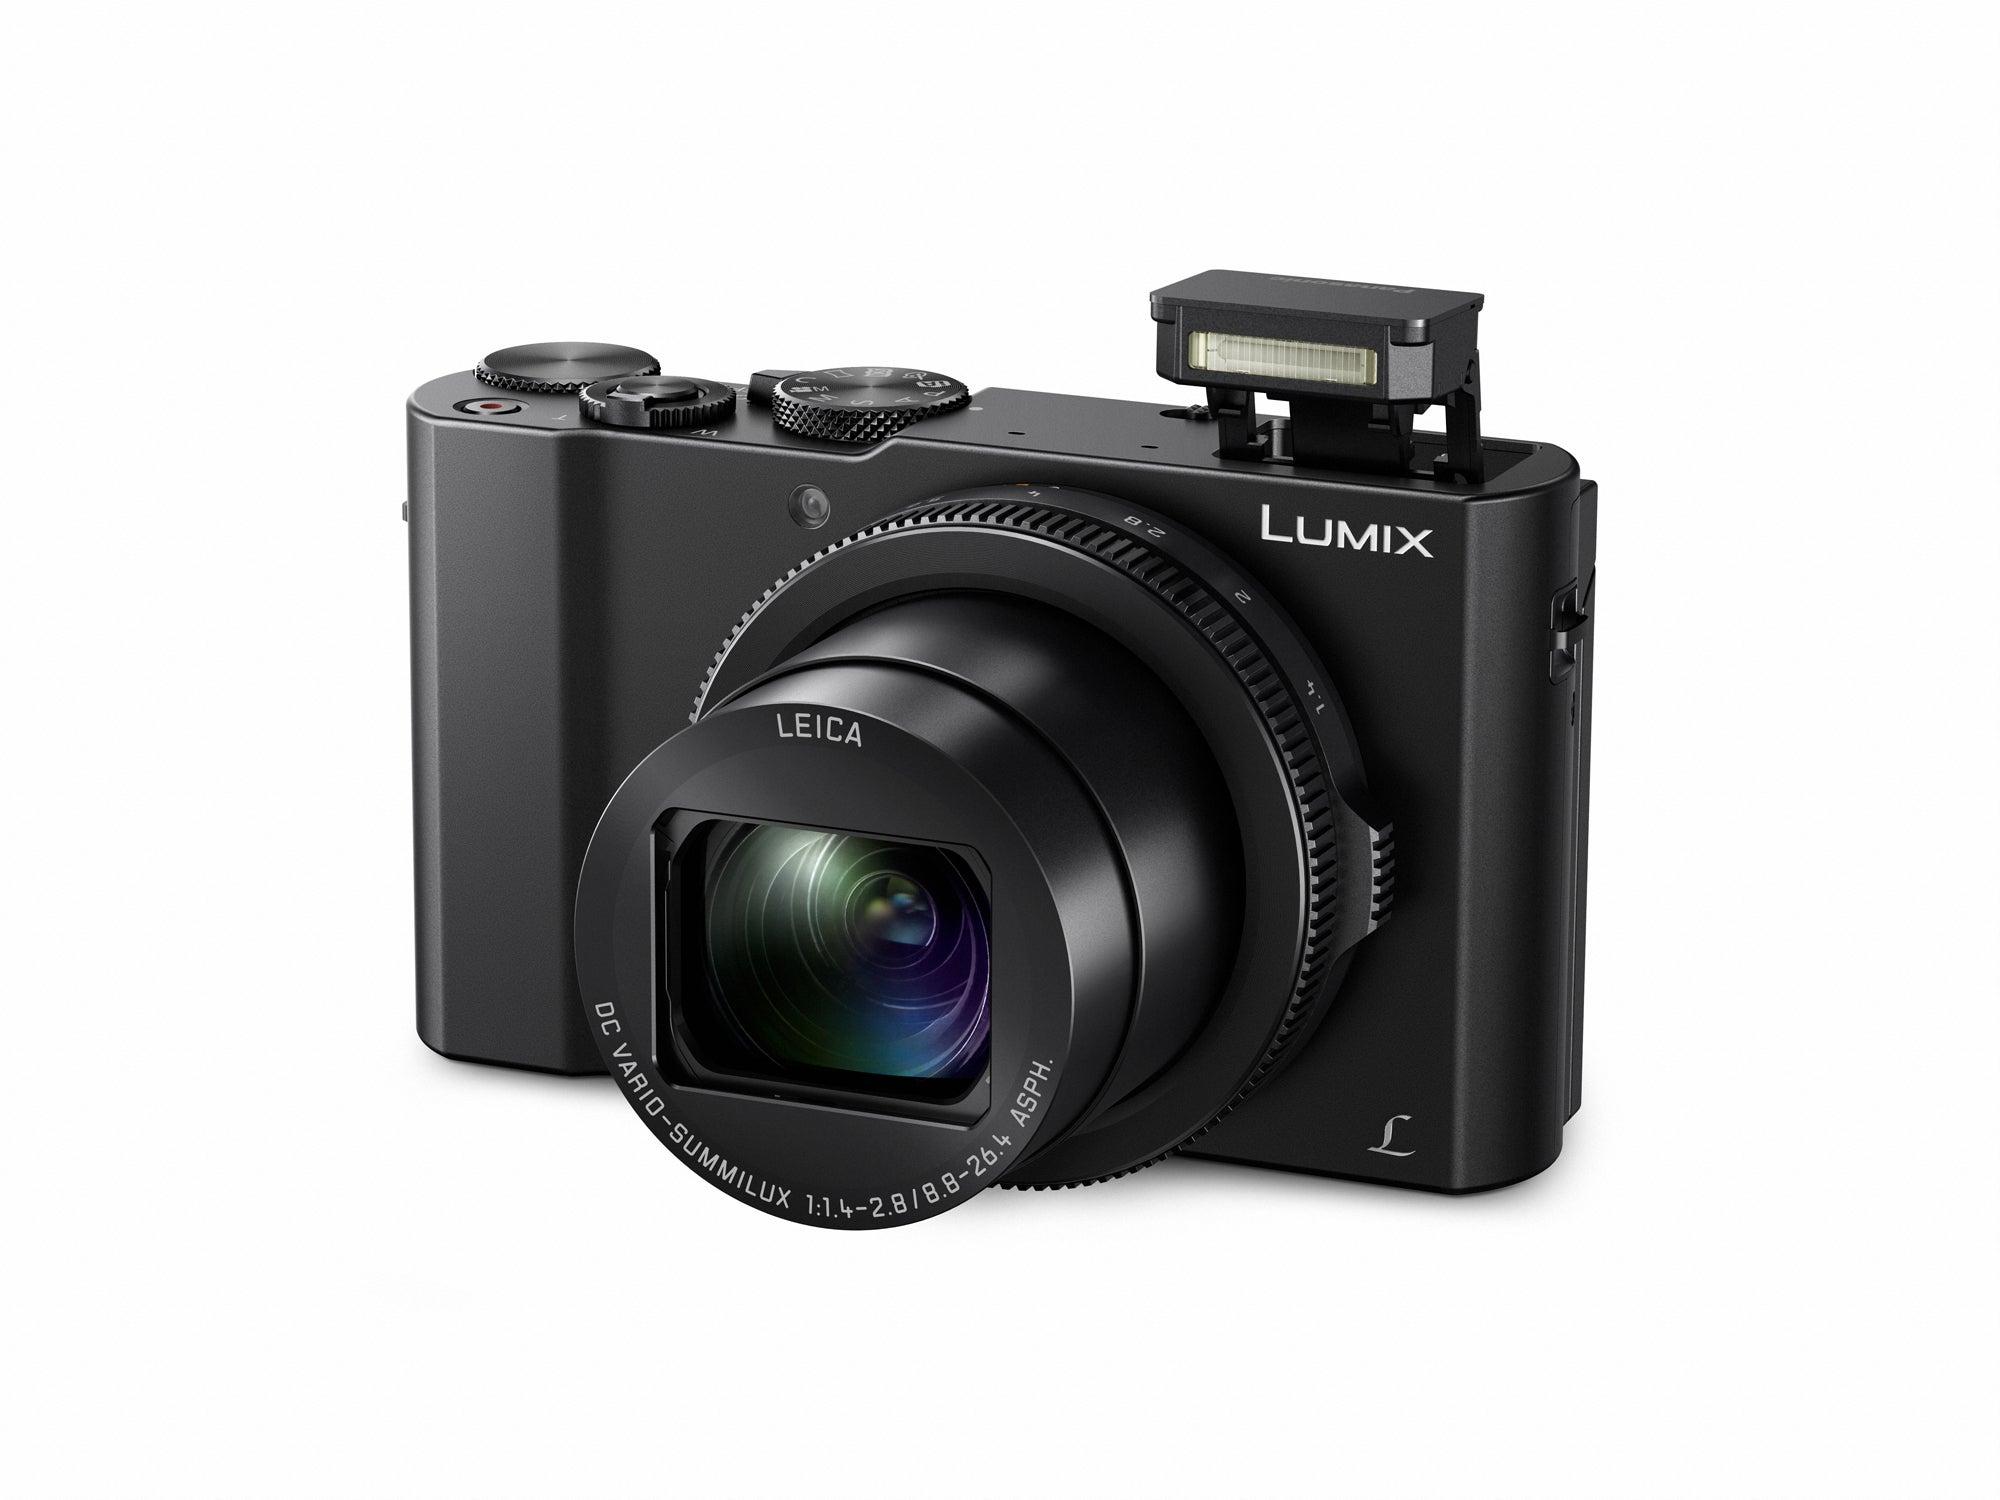 New Gear: Panasonic Lumix LX15 with 1-inch Sensor and f/1.4 Leica DC Vario-Summilux Lens